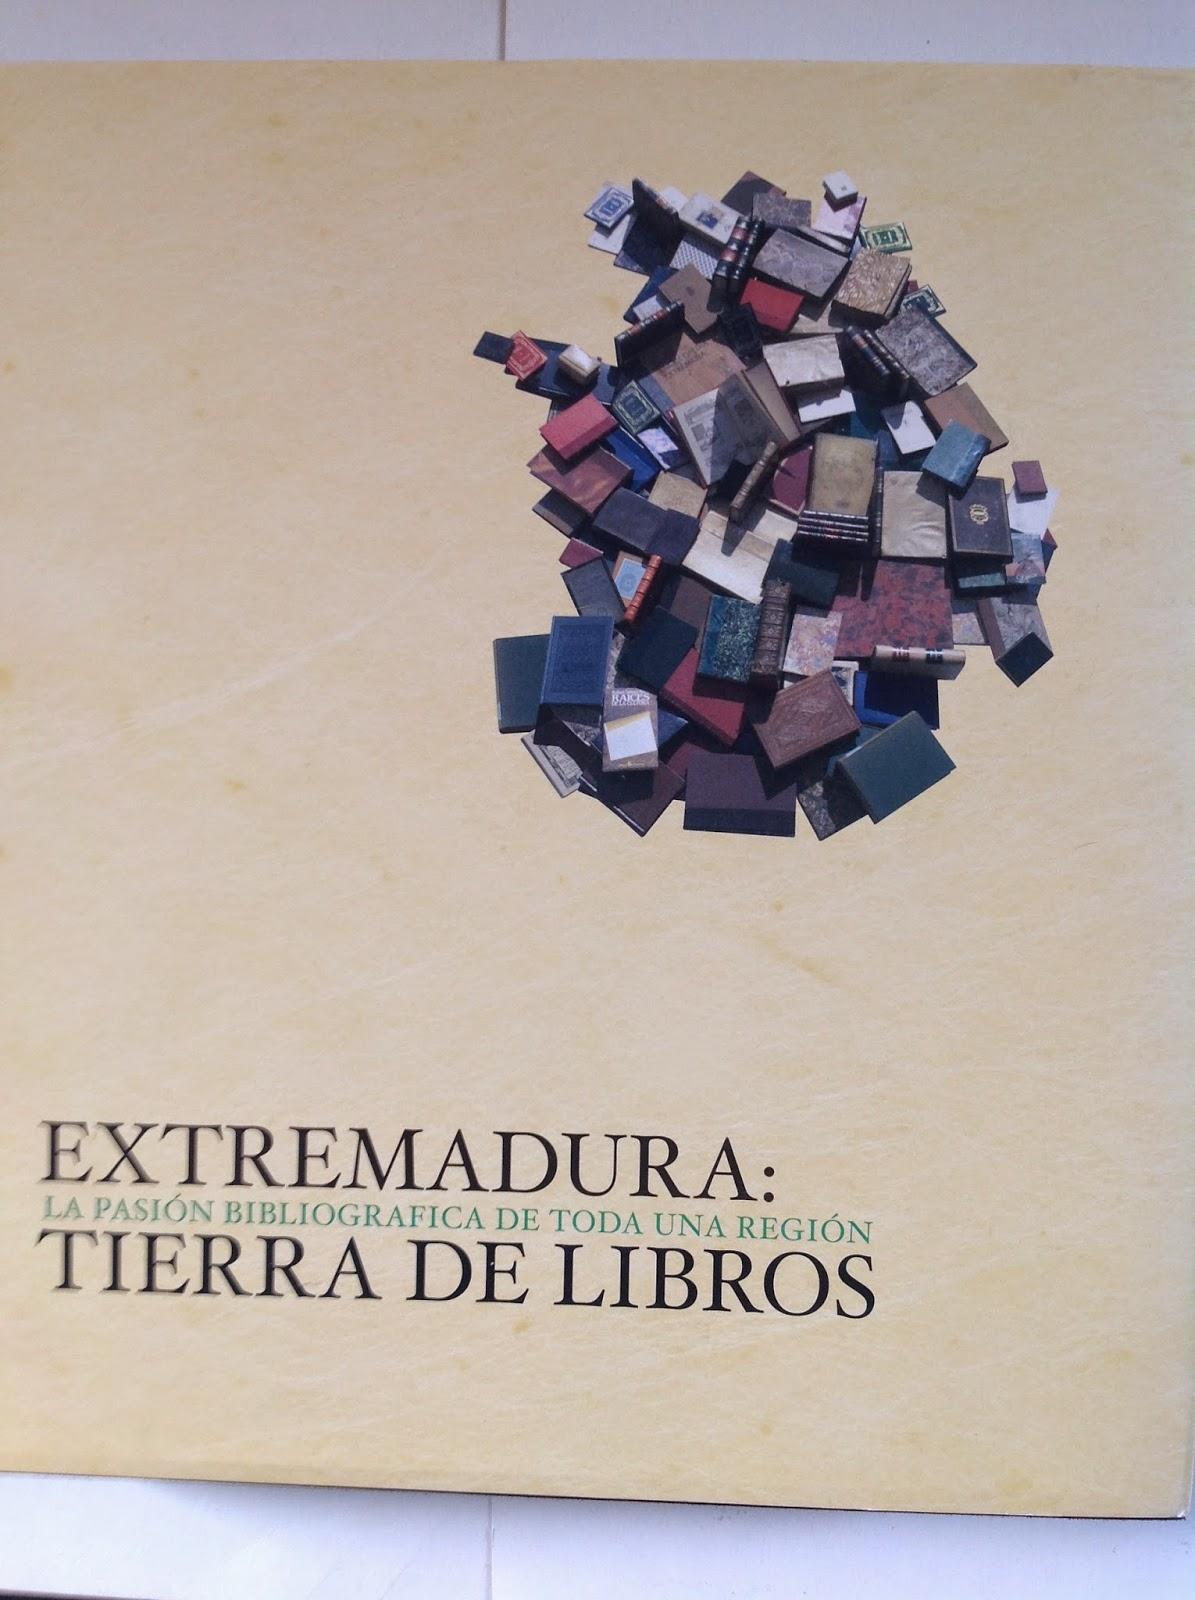 catalogo erotico jesus junta extremadura: